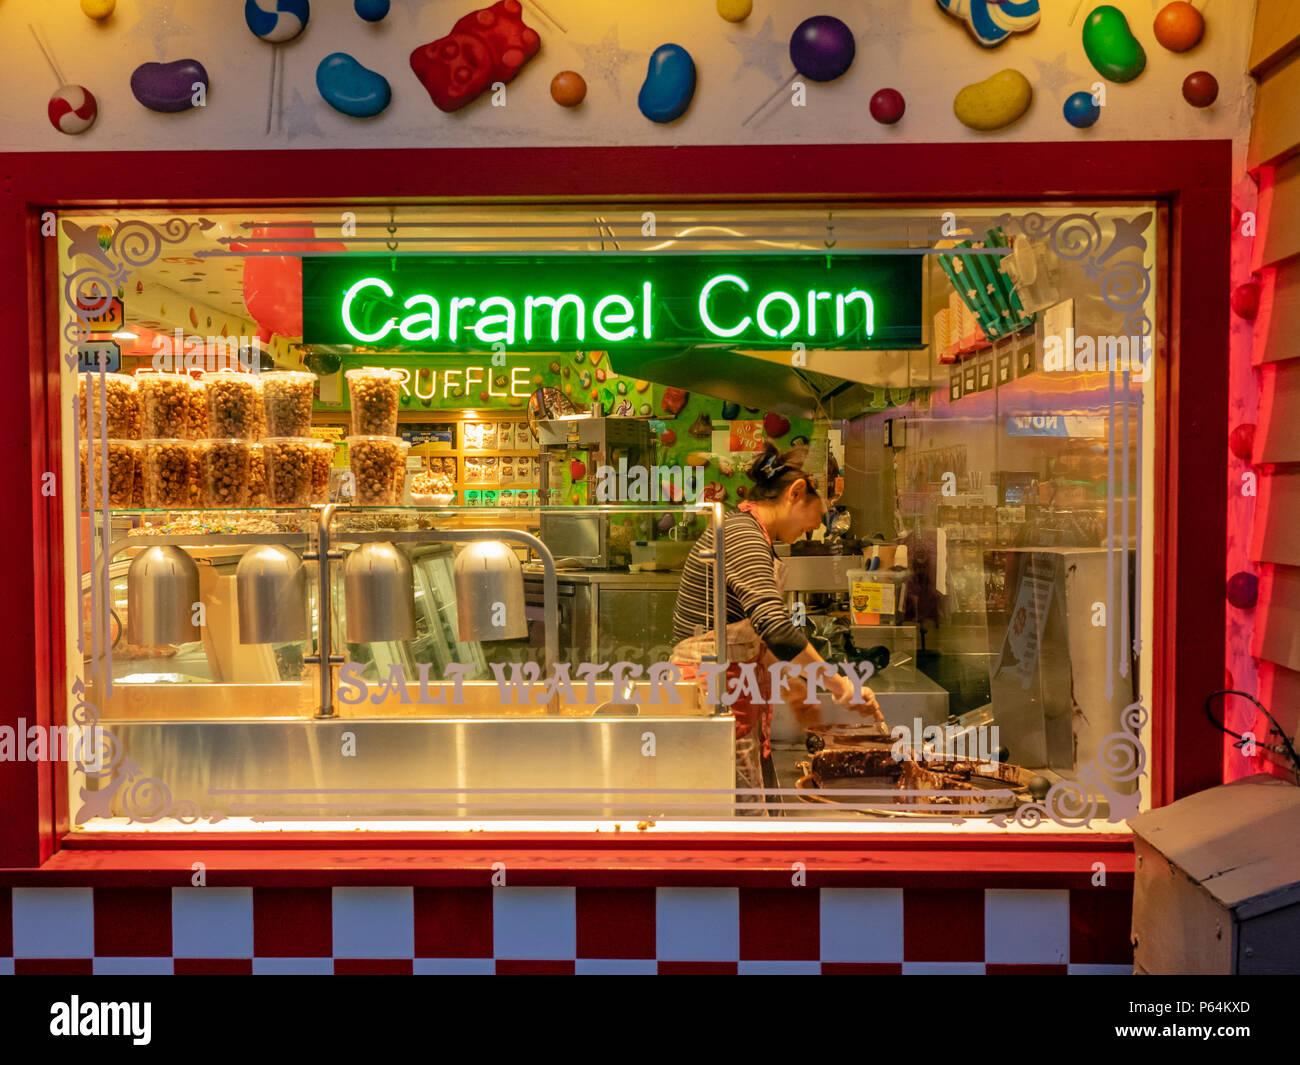 Caramel Corn Shop on Fisherman's Wharf in Monterey, California, USA. - Stock Image